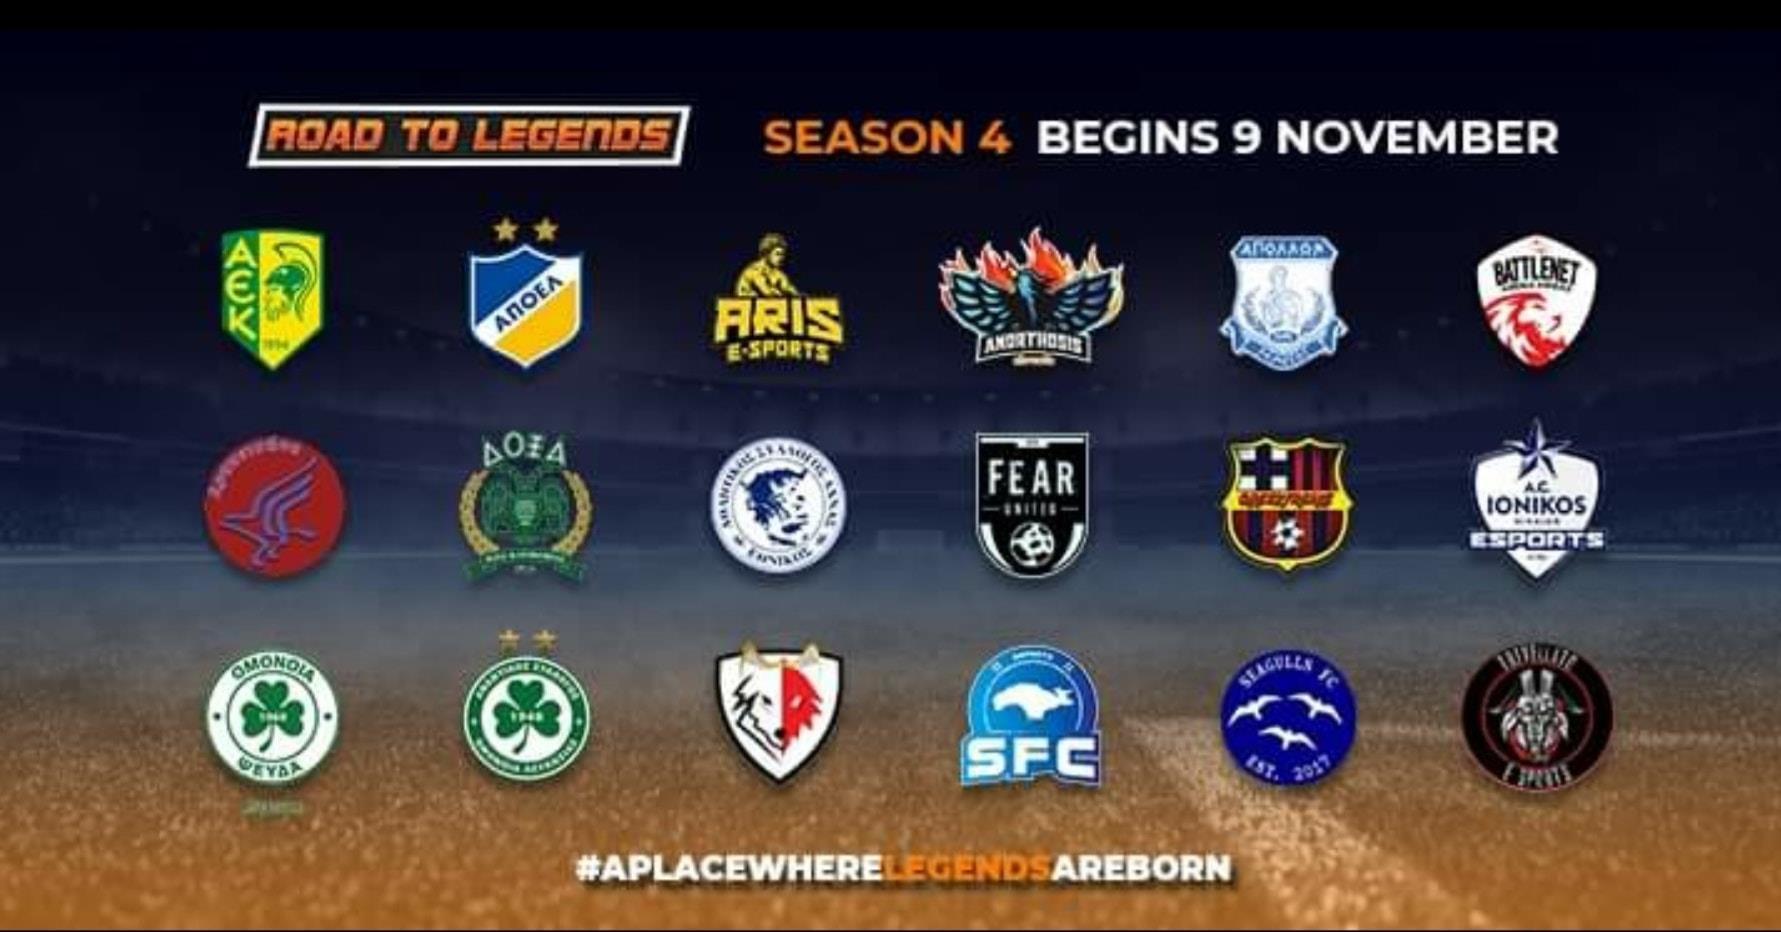 E-Sports: Πρεμιέρα στο πρωτάθλημα e-Football για τον ΑΡΗ